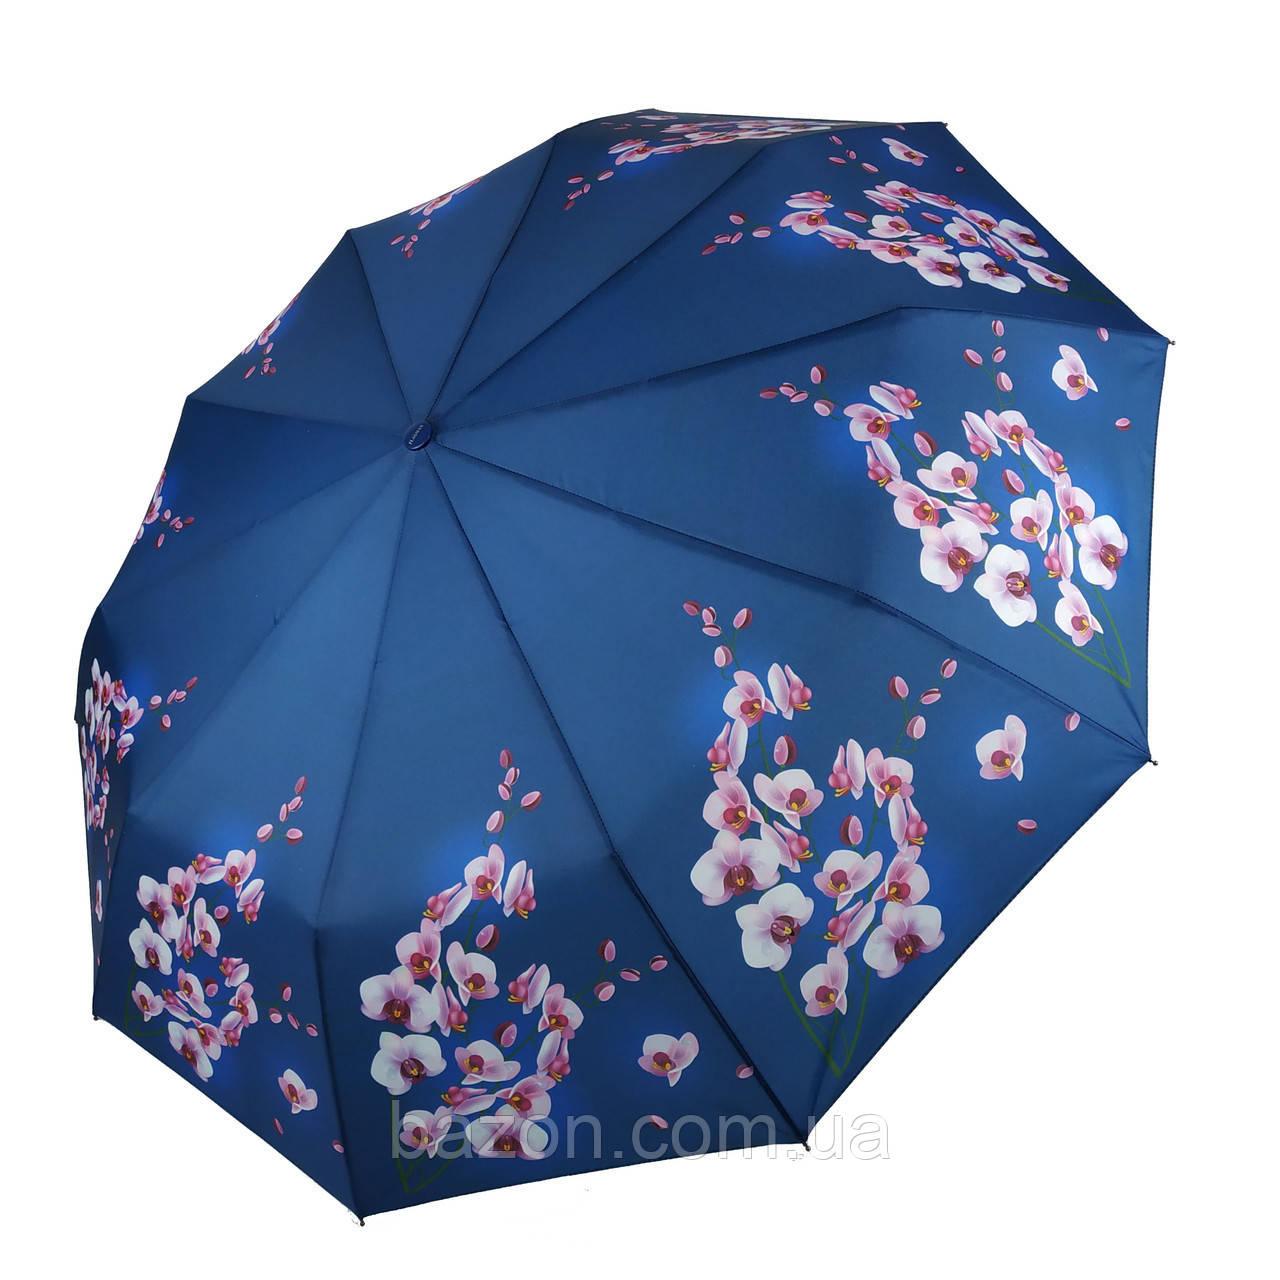 Женский зонтик полуавтомат с орхидеями от Flagman / Флагман, синий,  733-6